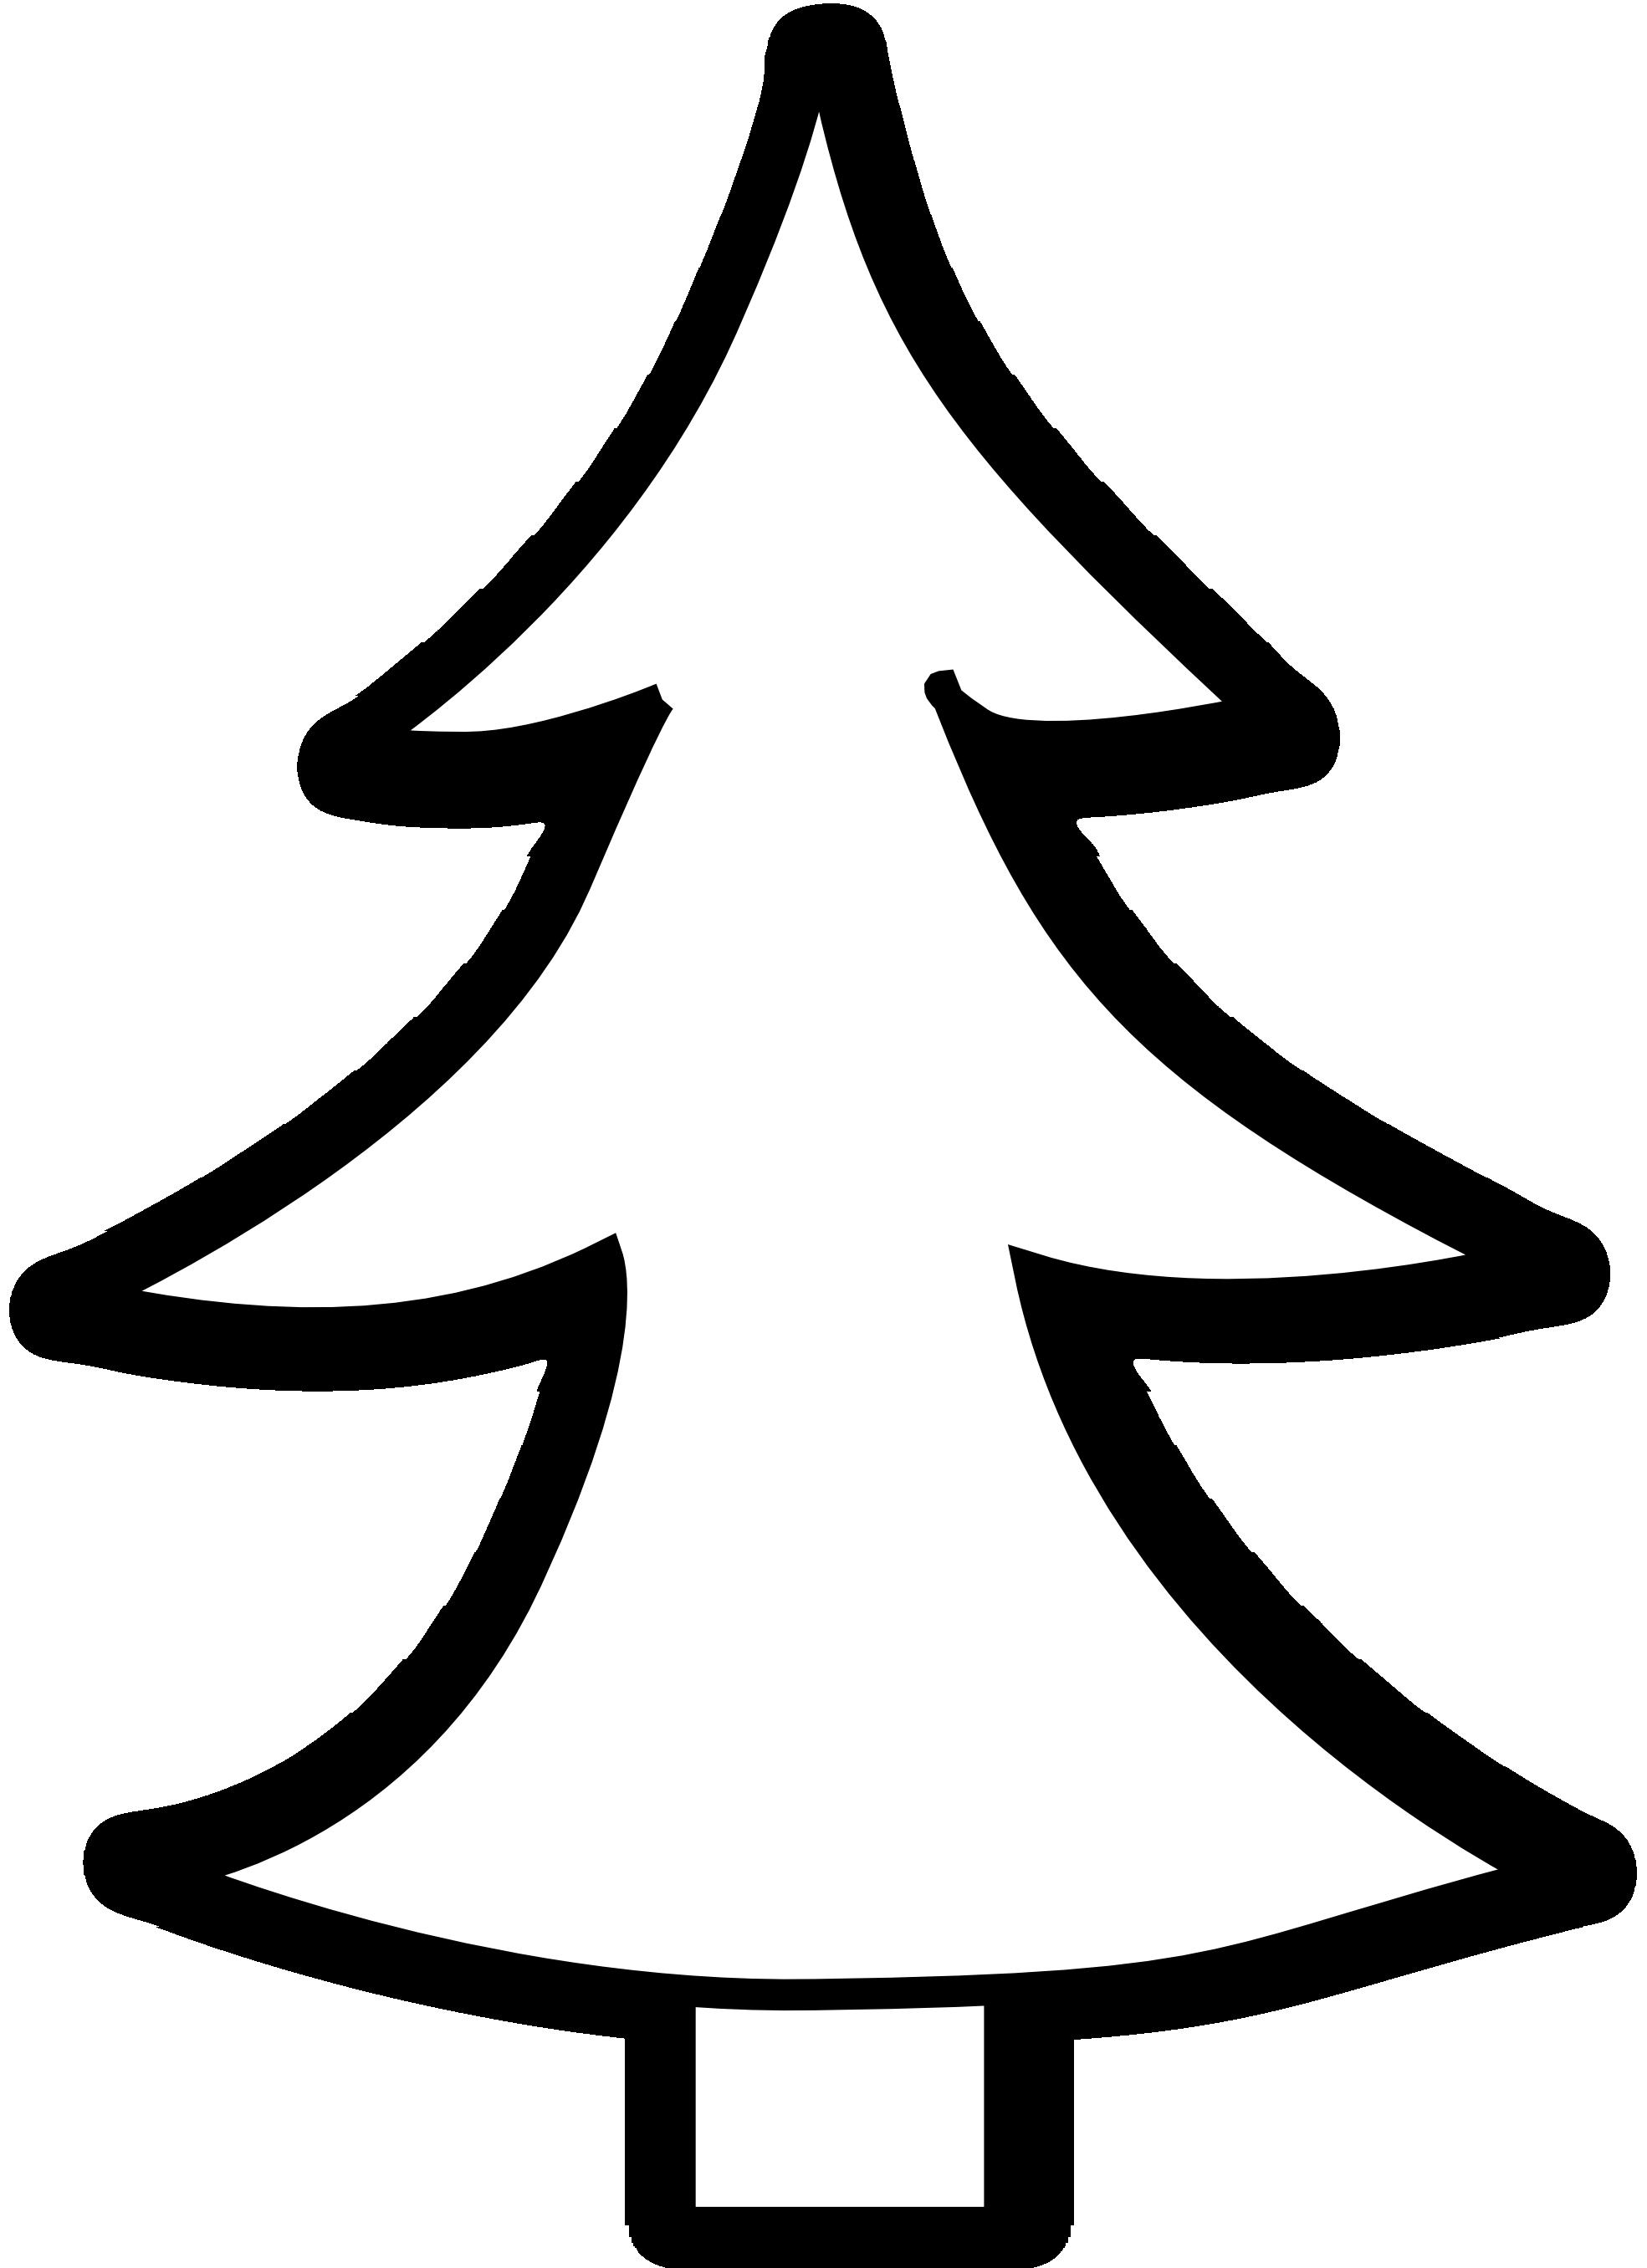 Pine tree clipart black Clipart Panda Free Clipart